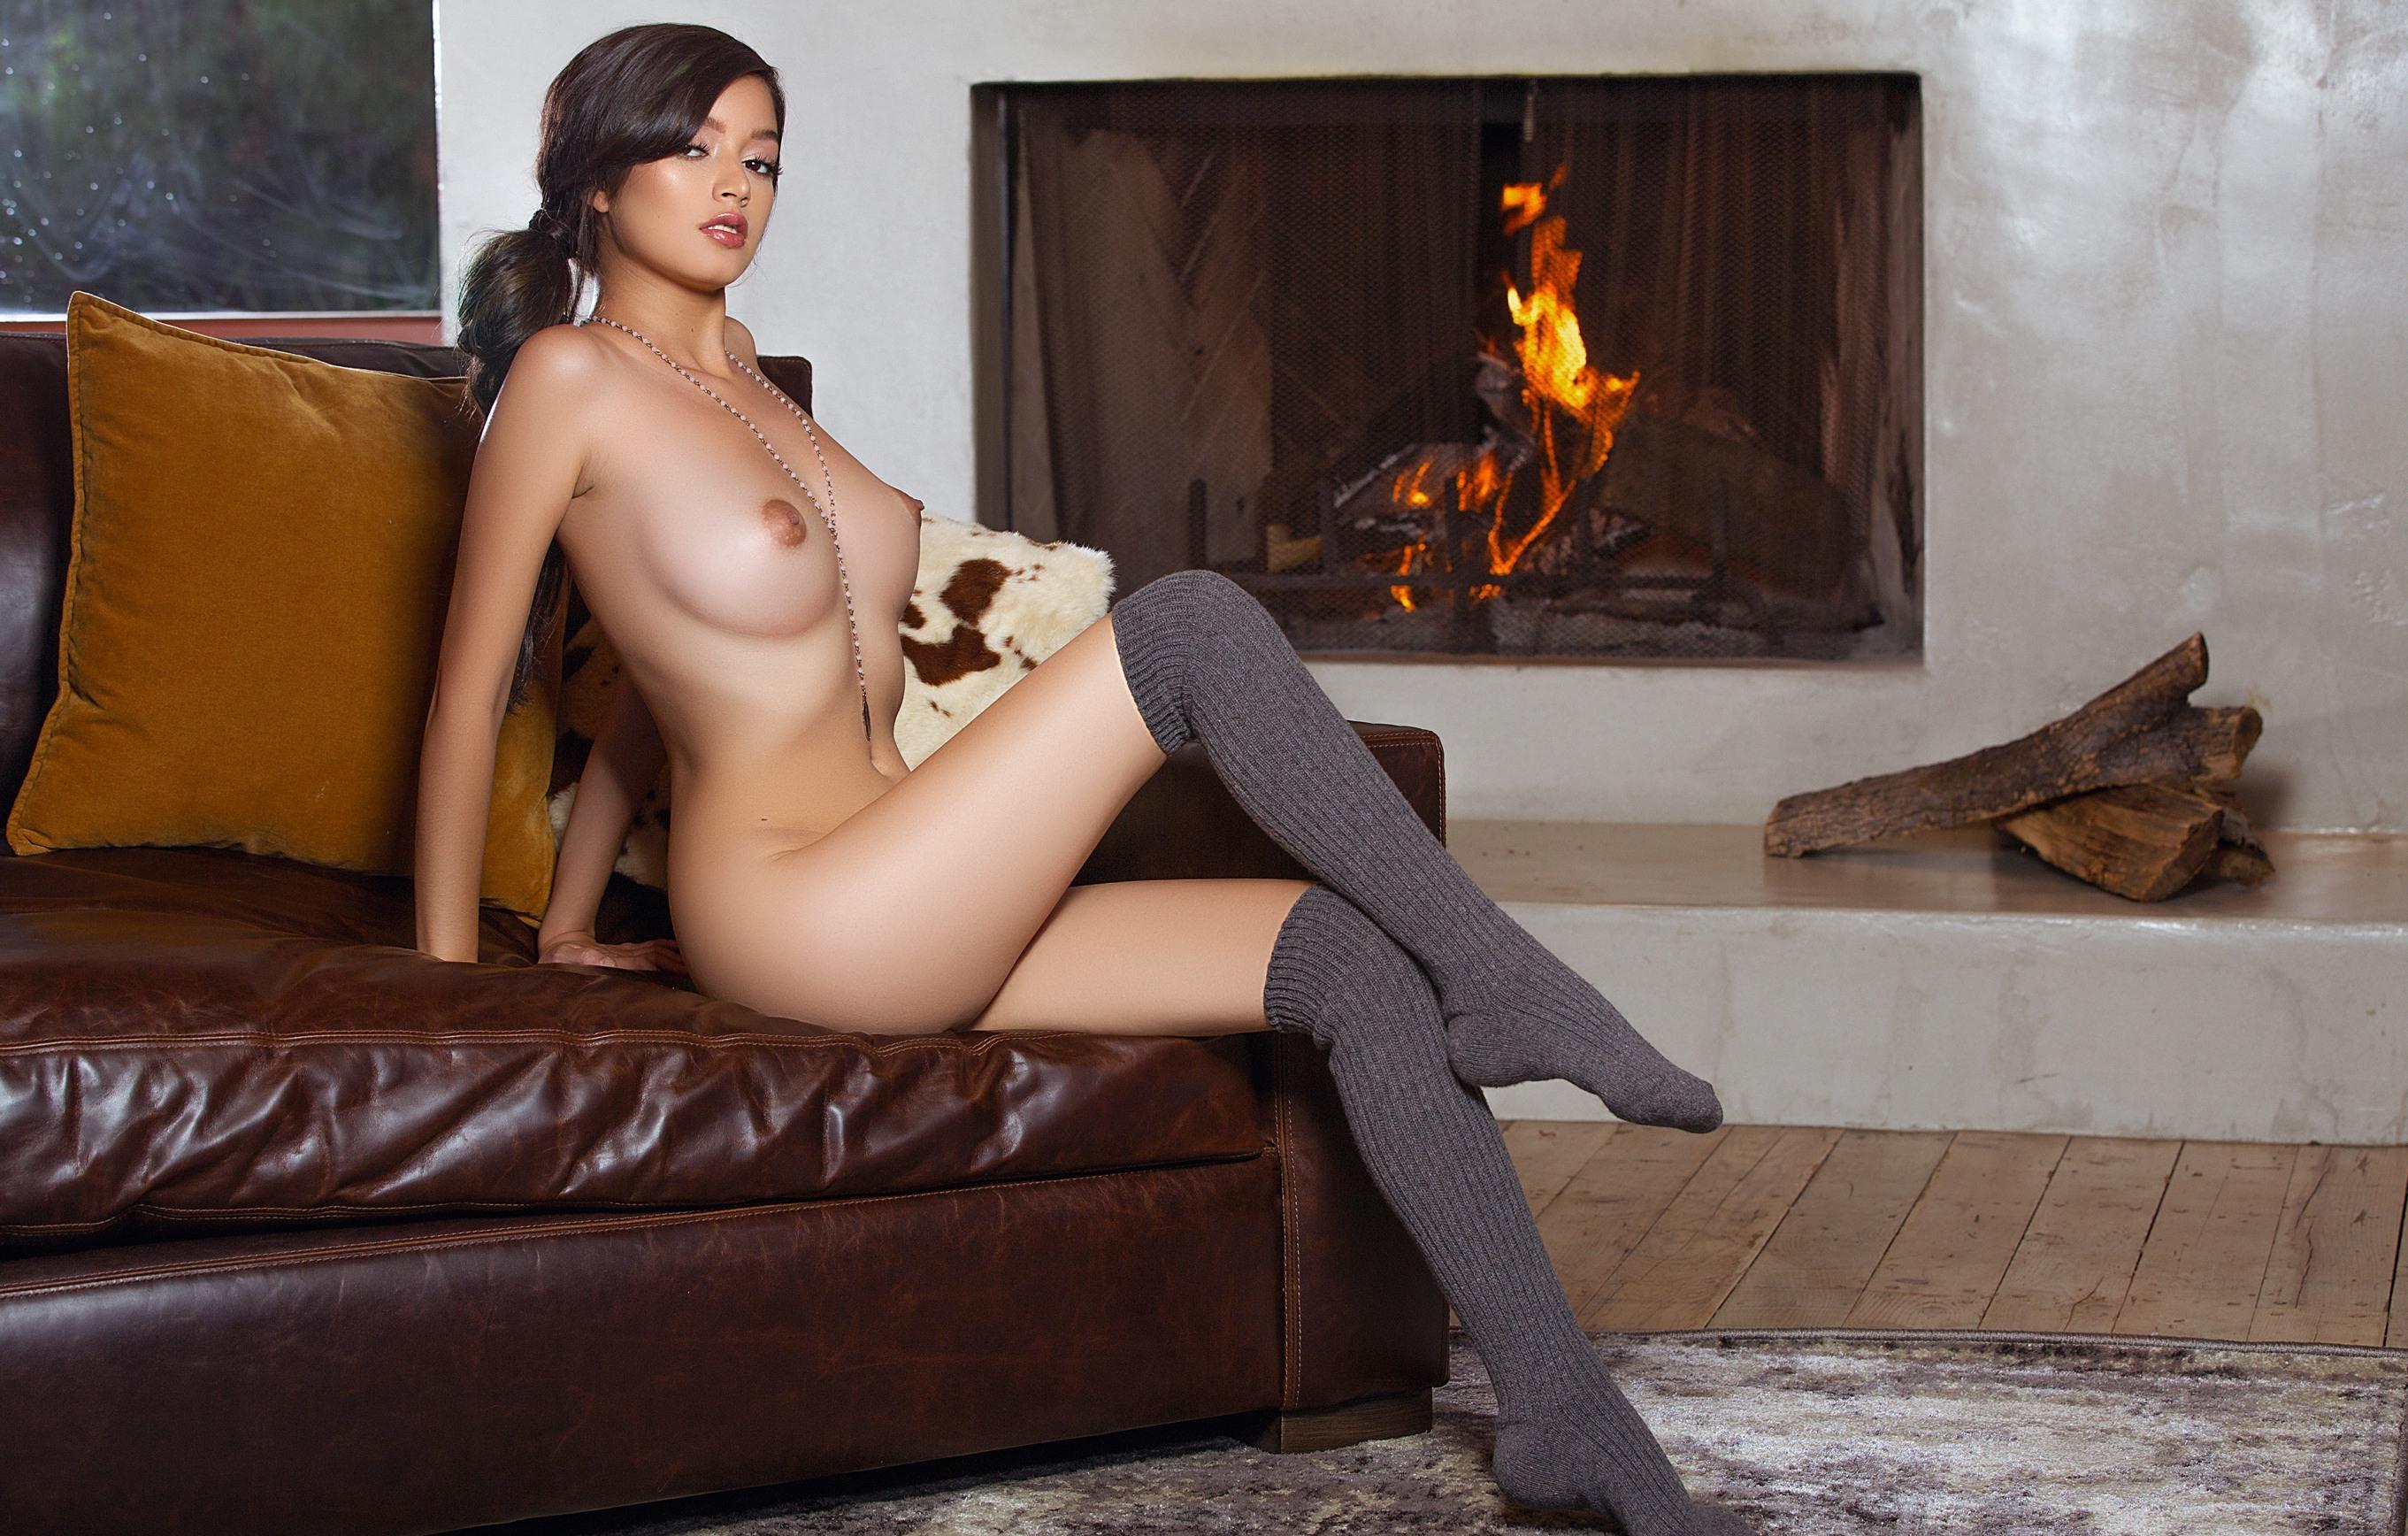 Abelinda pleasuring herself XXX images HD